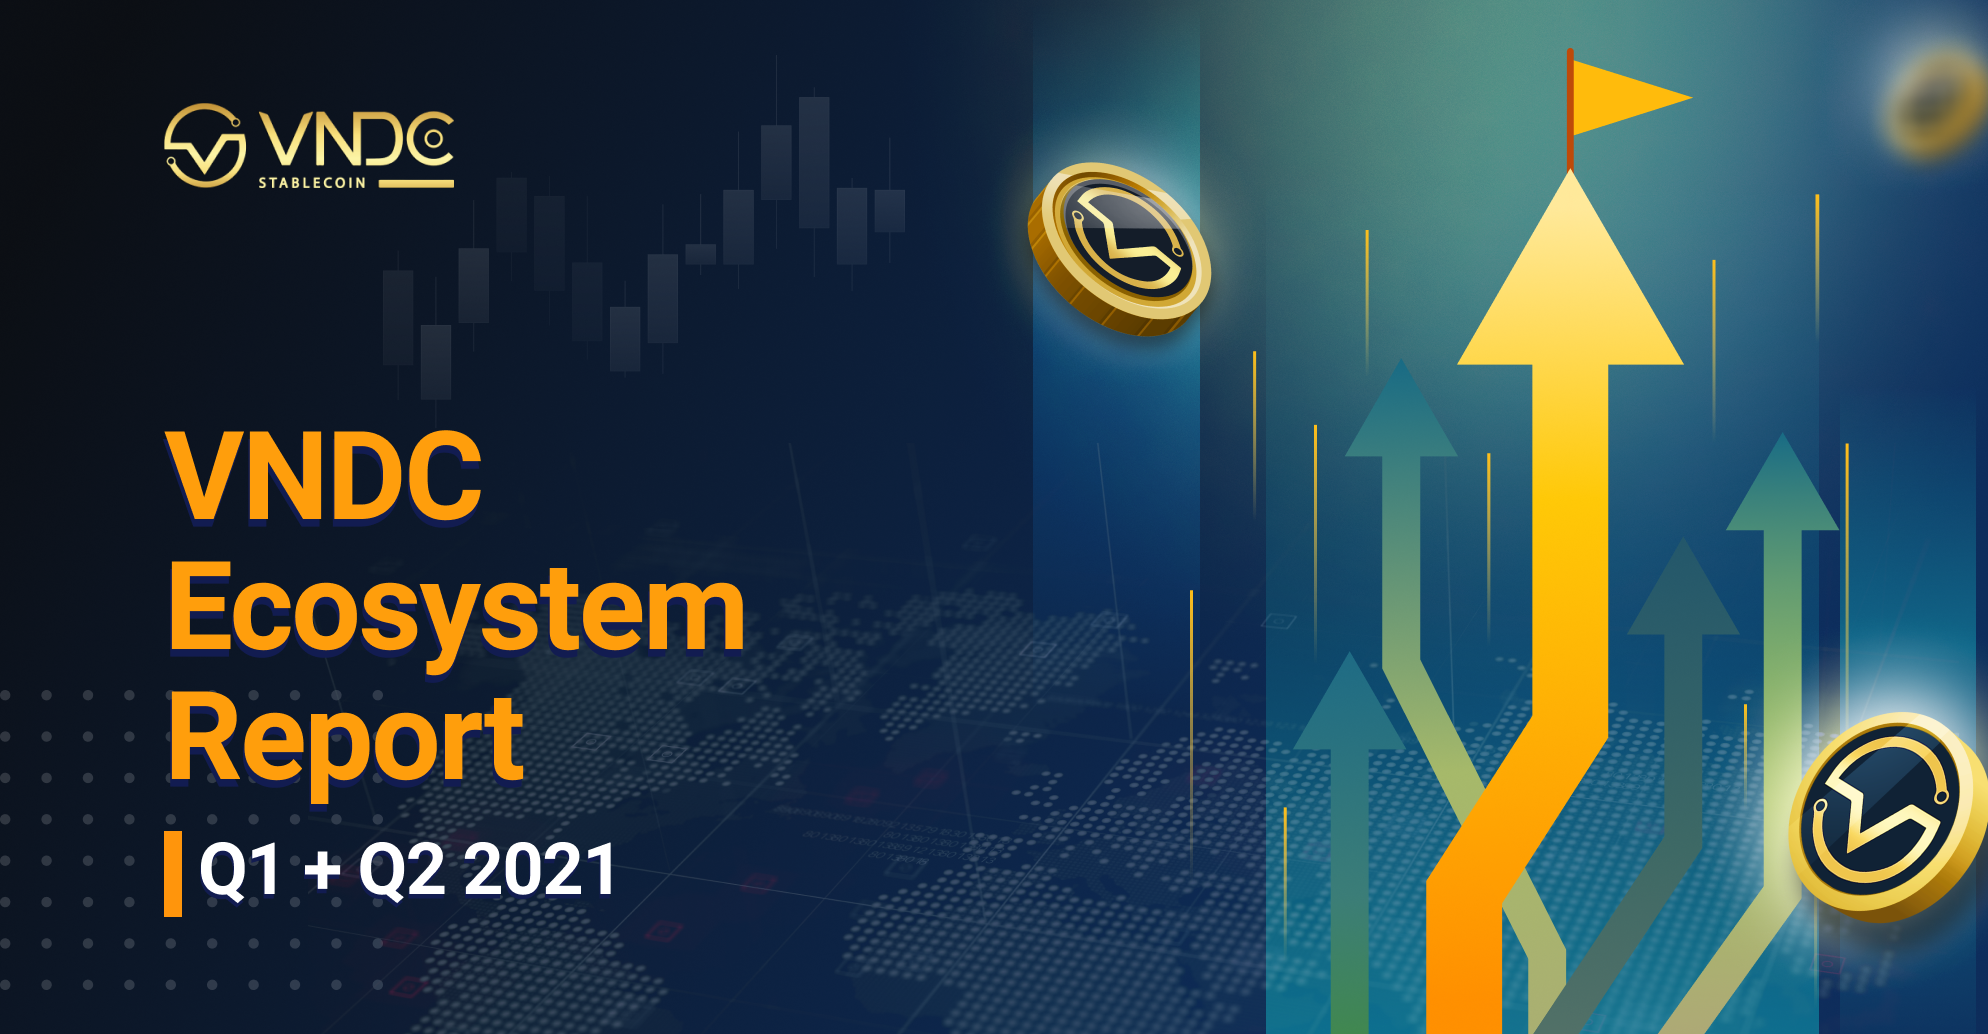 VNDC publishes VNDC Ecosystem Report Q1+Q2 2021